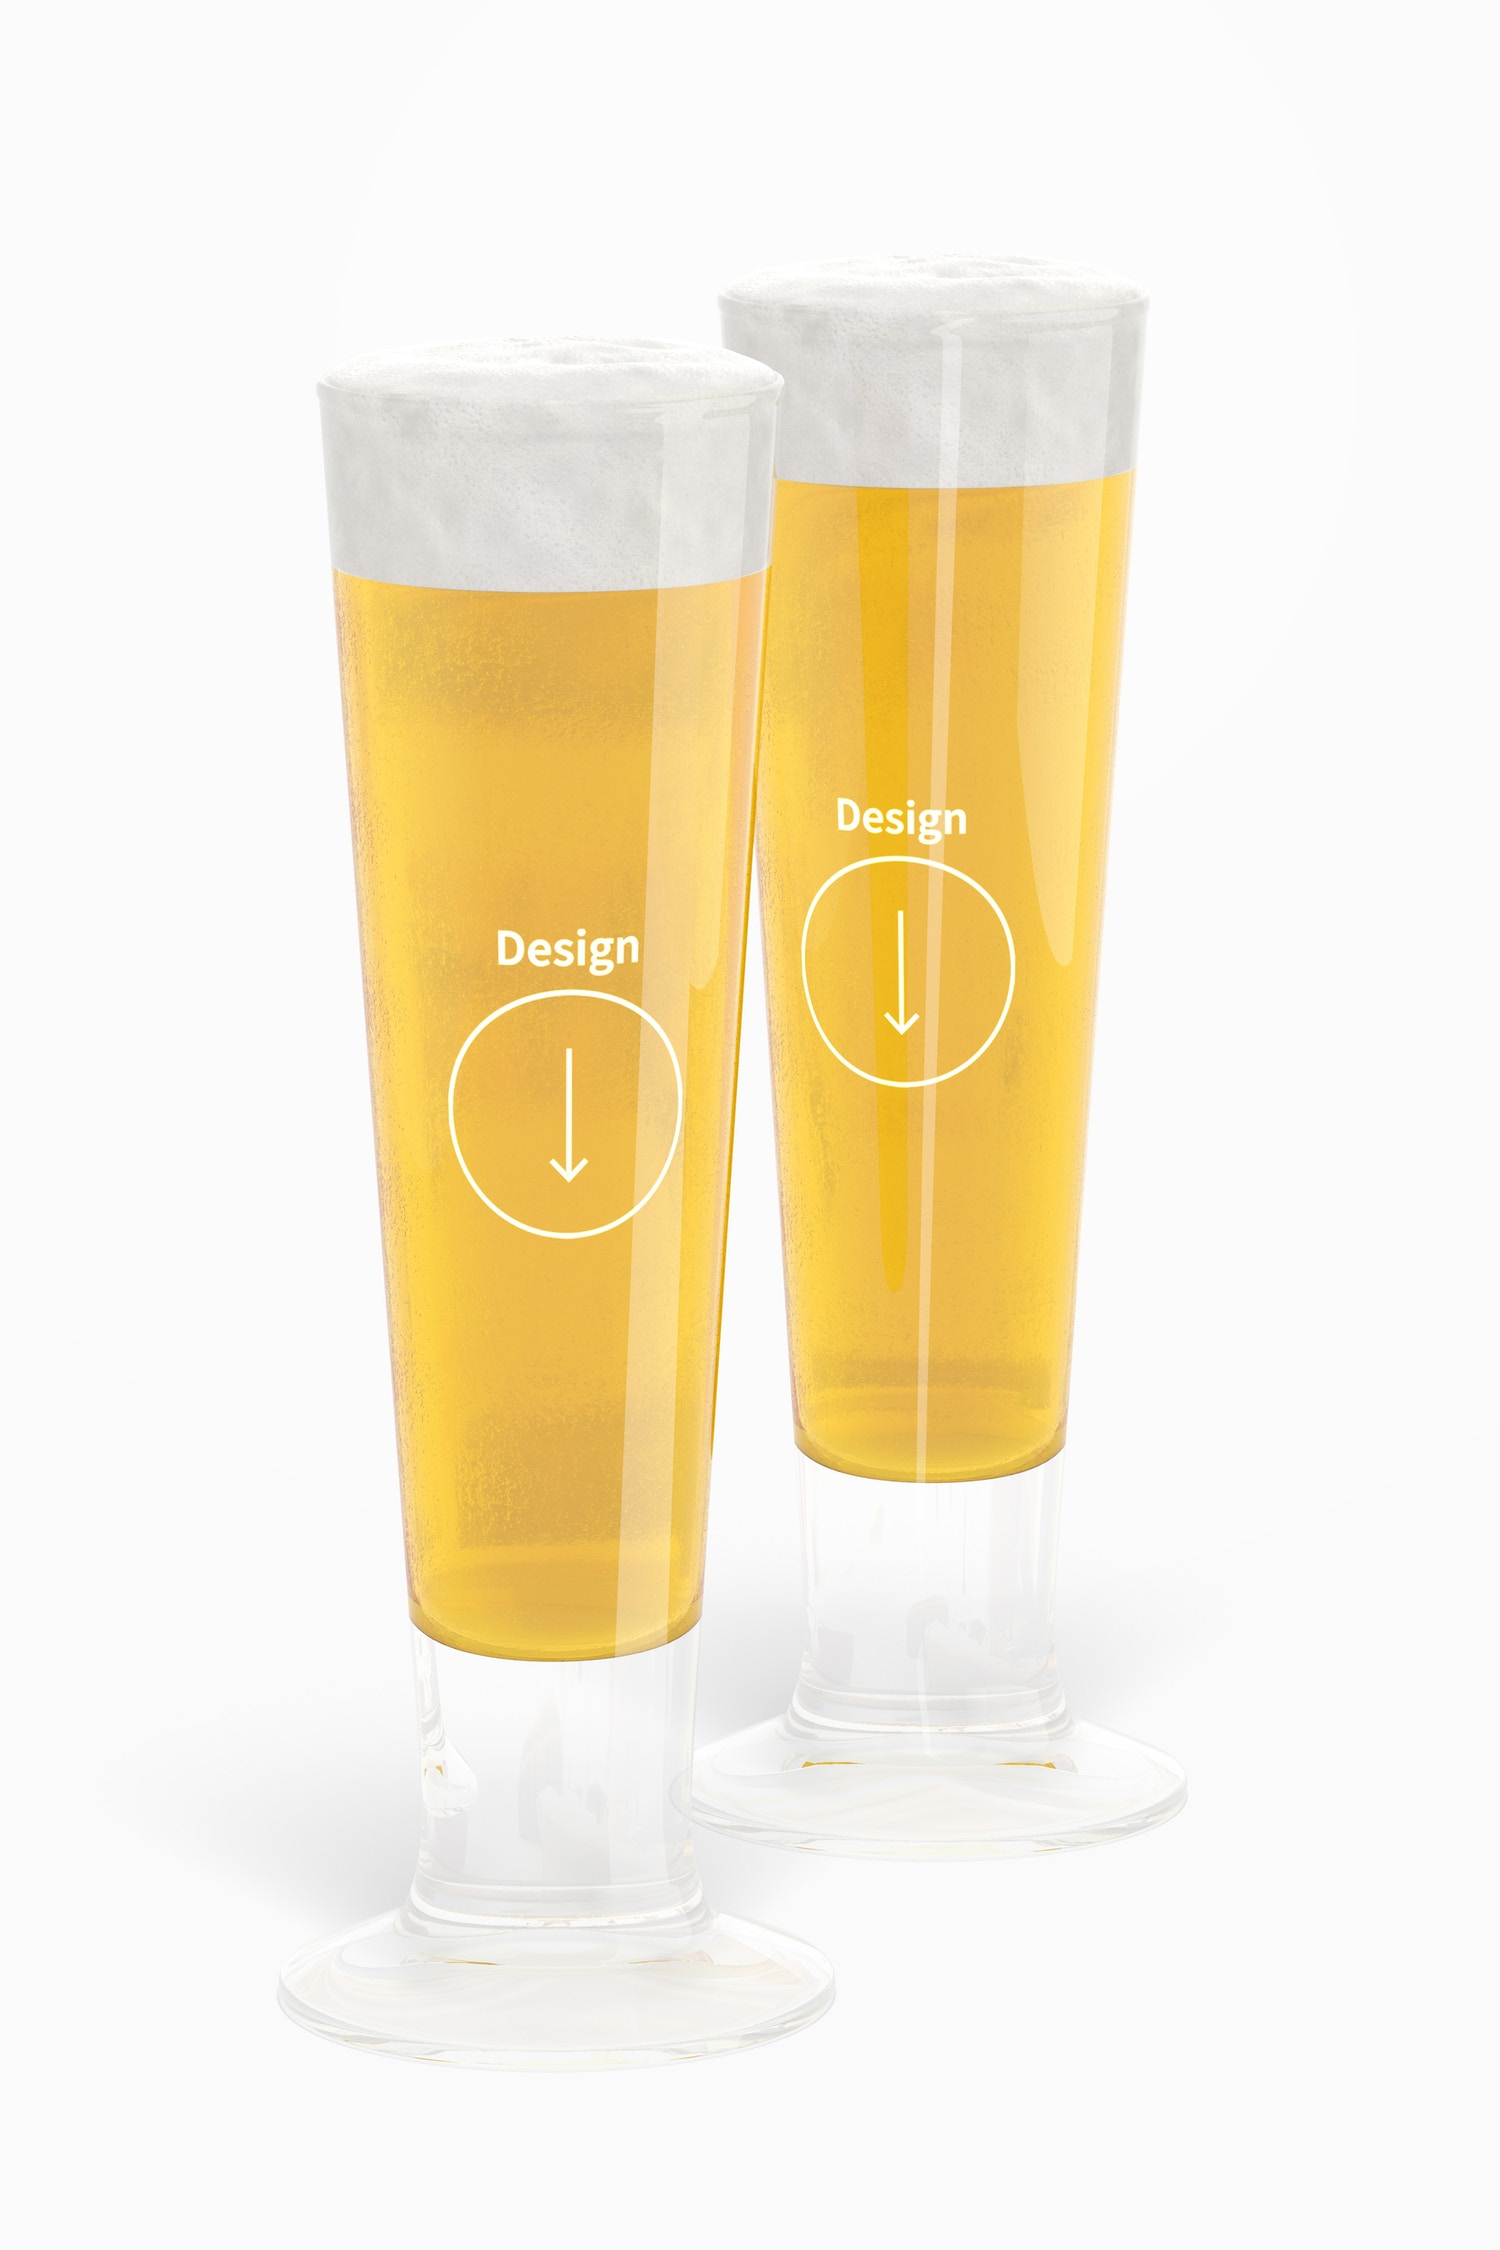 14 oz Glass Beer Cups Mockup 02